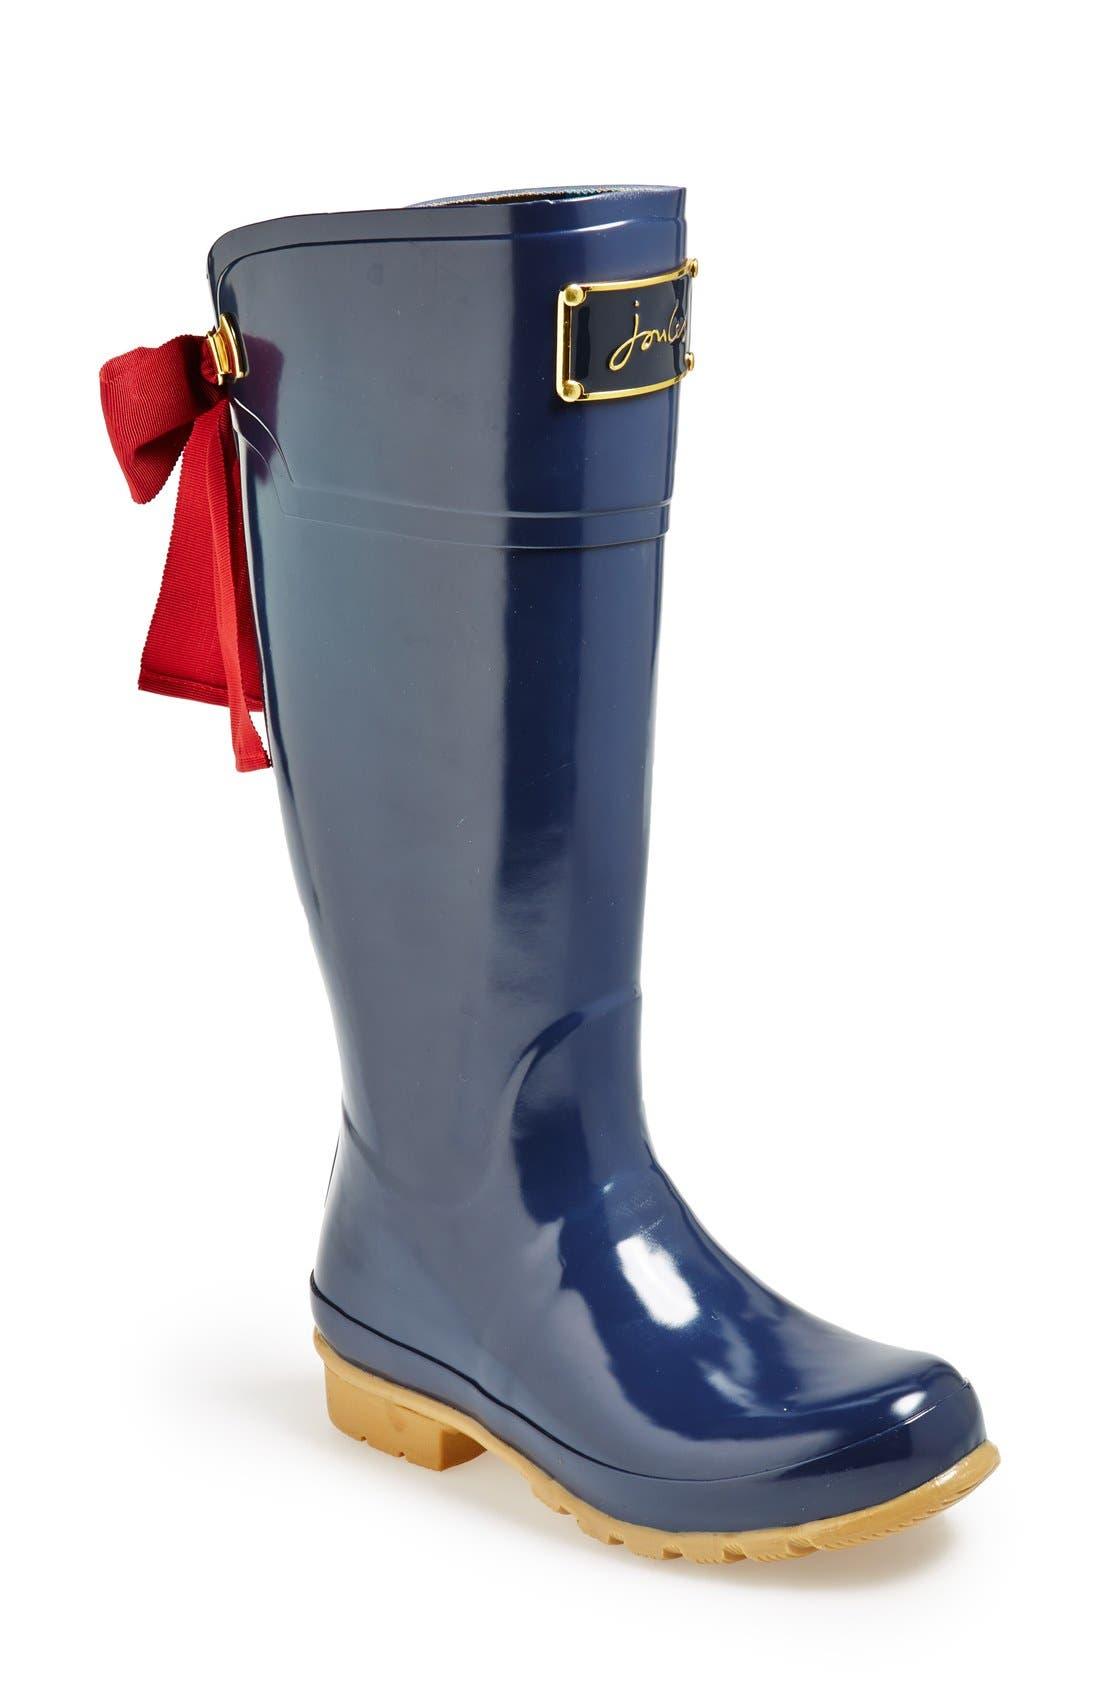 JOULES 'Evedon' Rain Boot